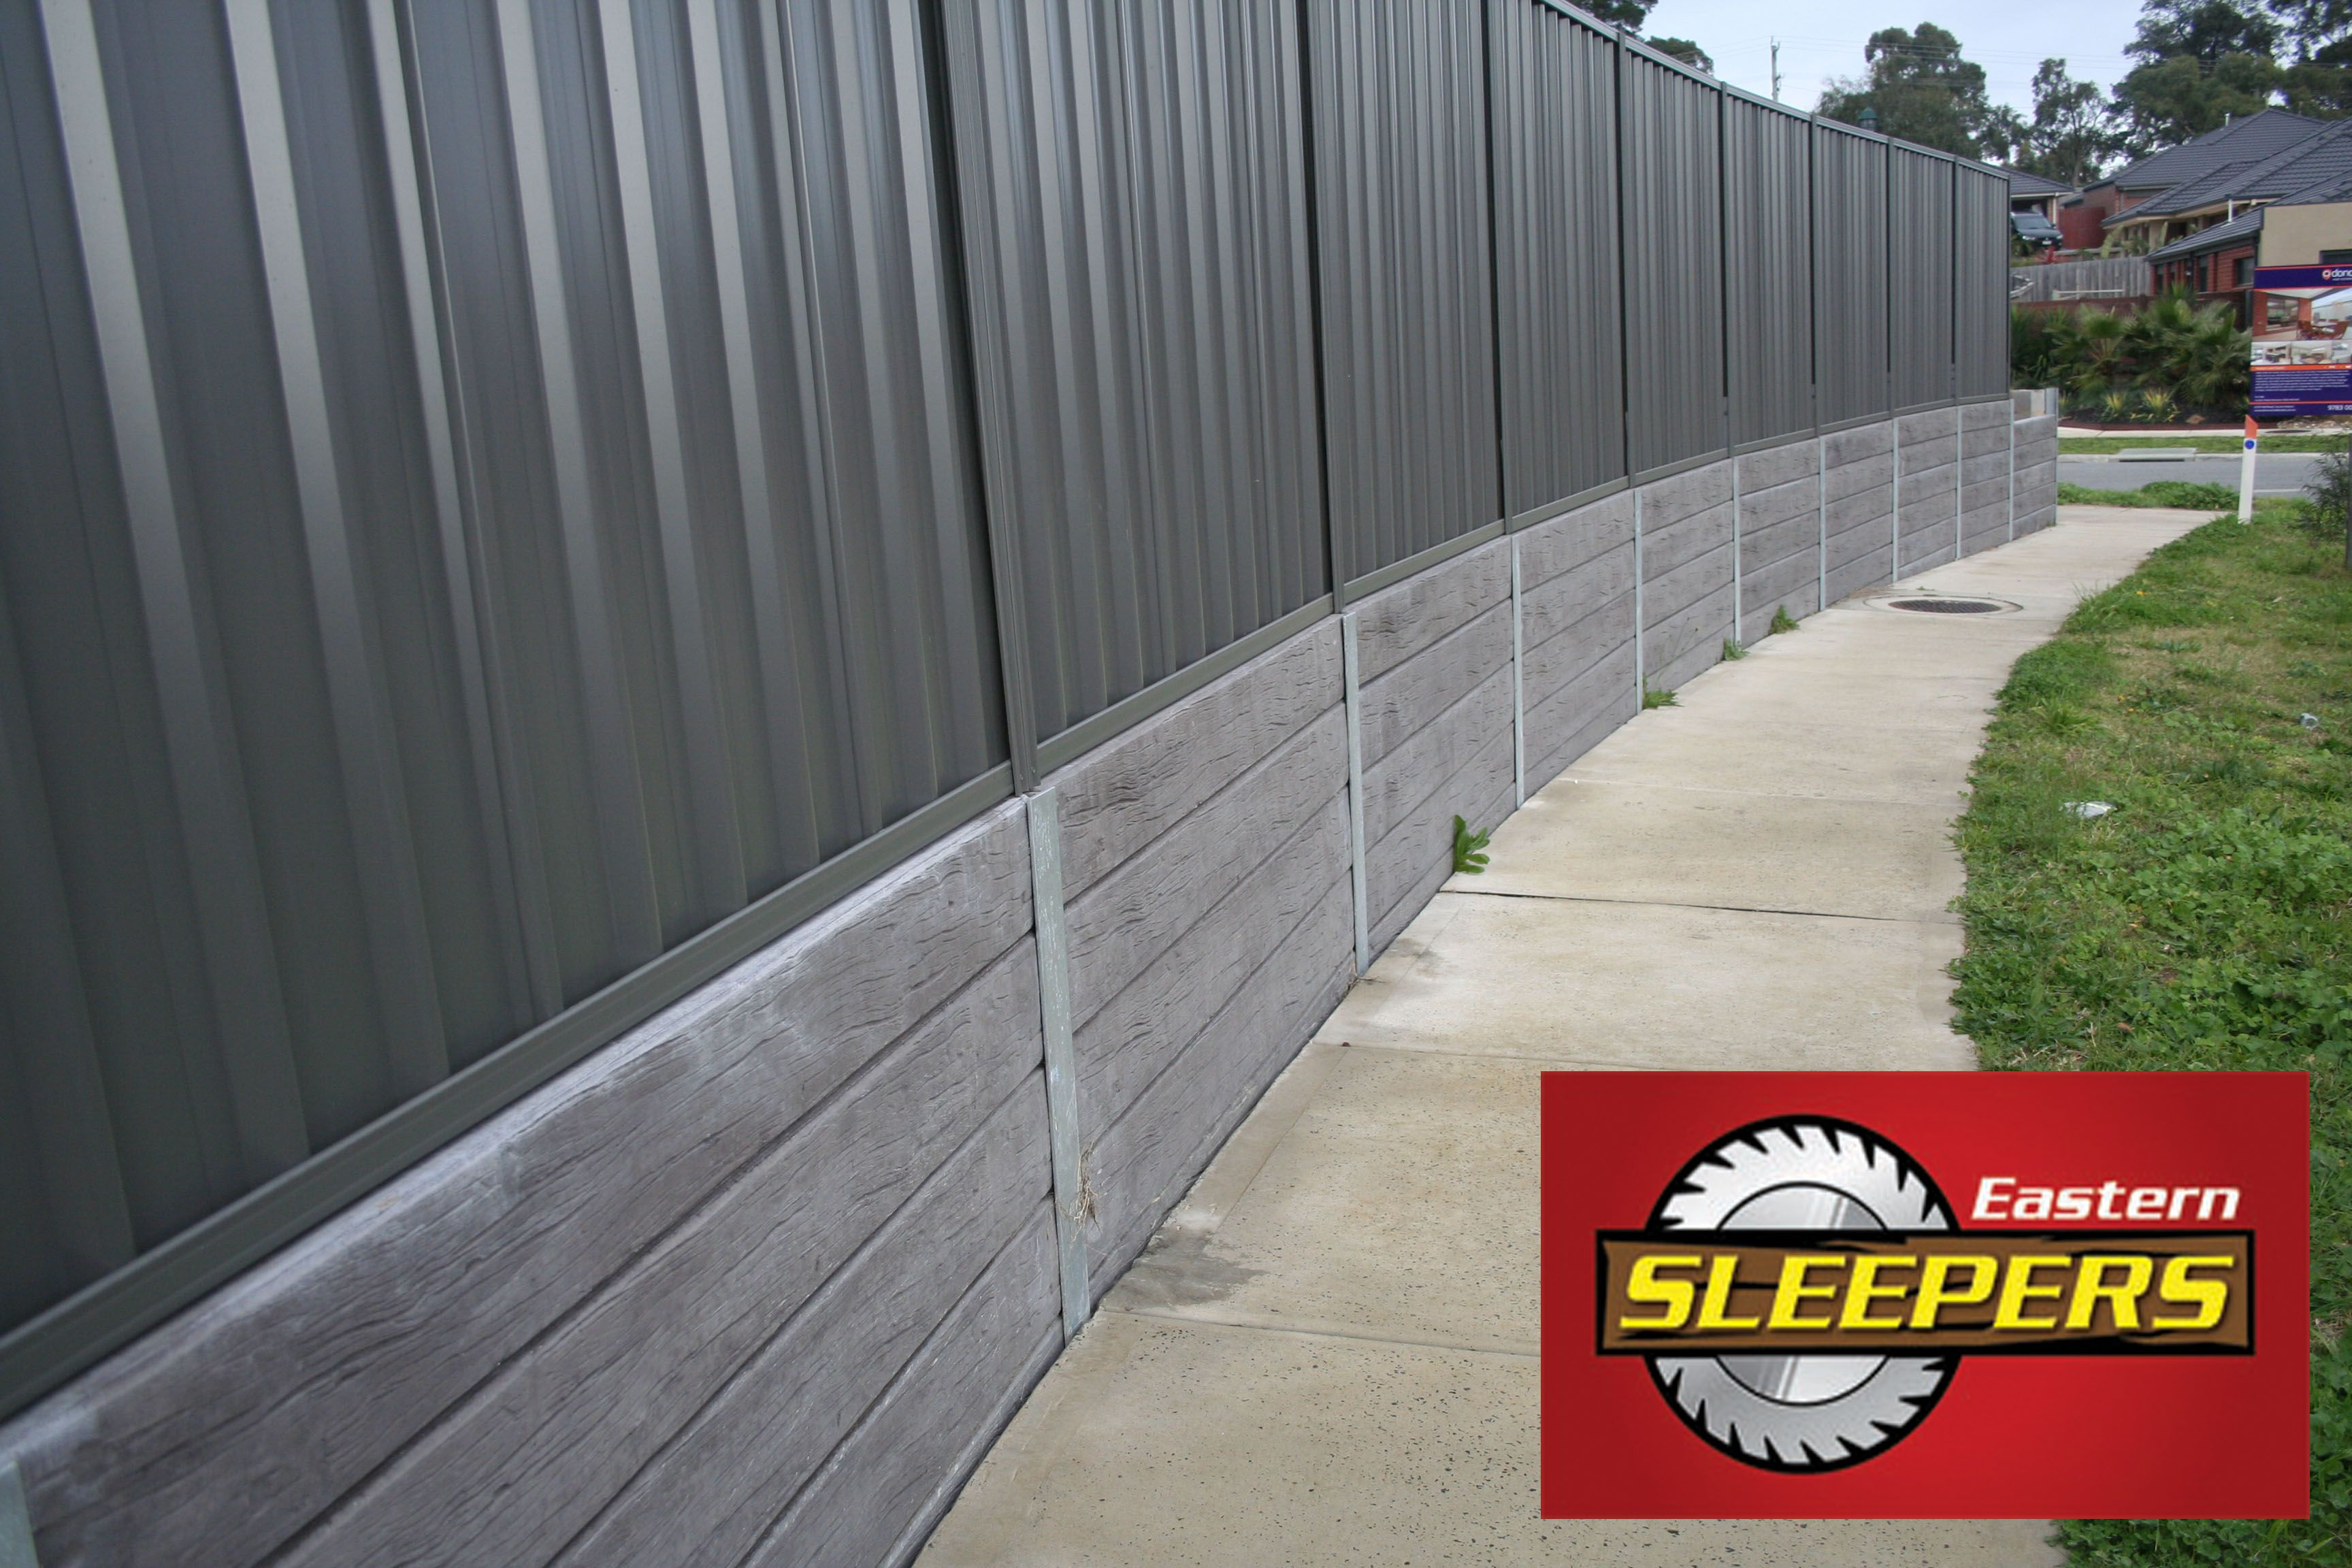 Concrete Railway Sleeper Retaining Wall Concrete Sleeper Landscaping Retaining Walls Backyard Landscaping Backyard